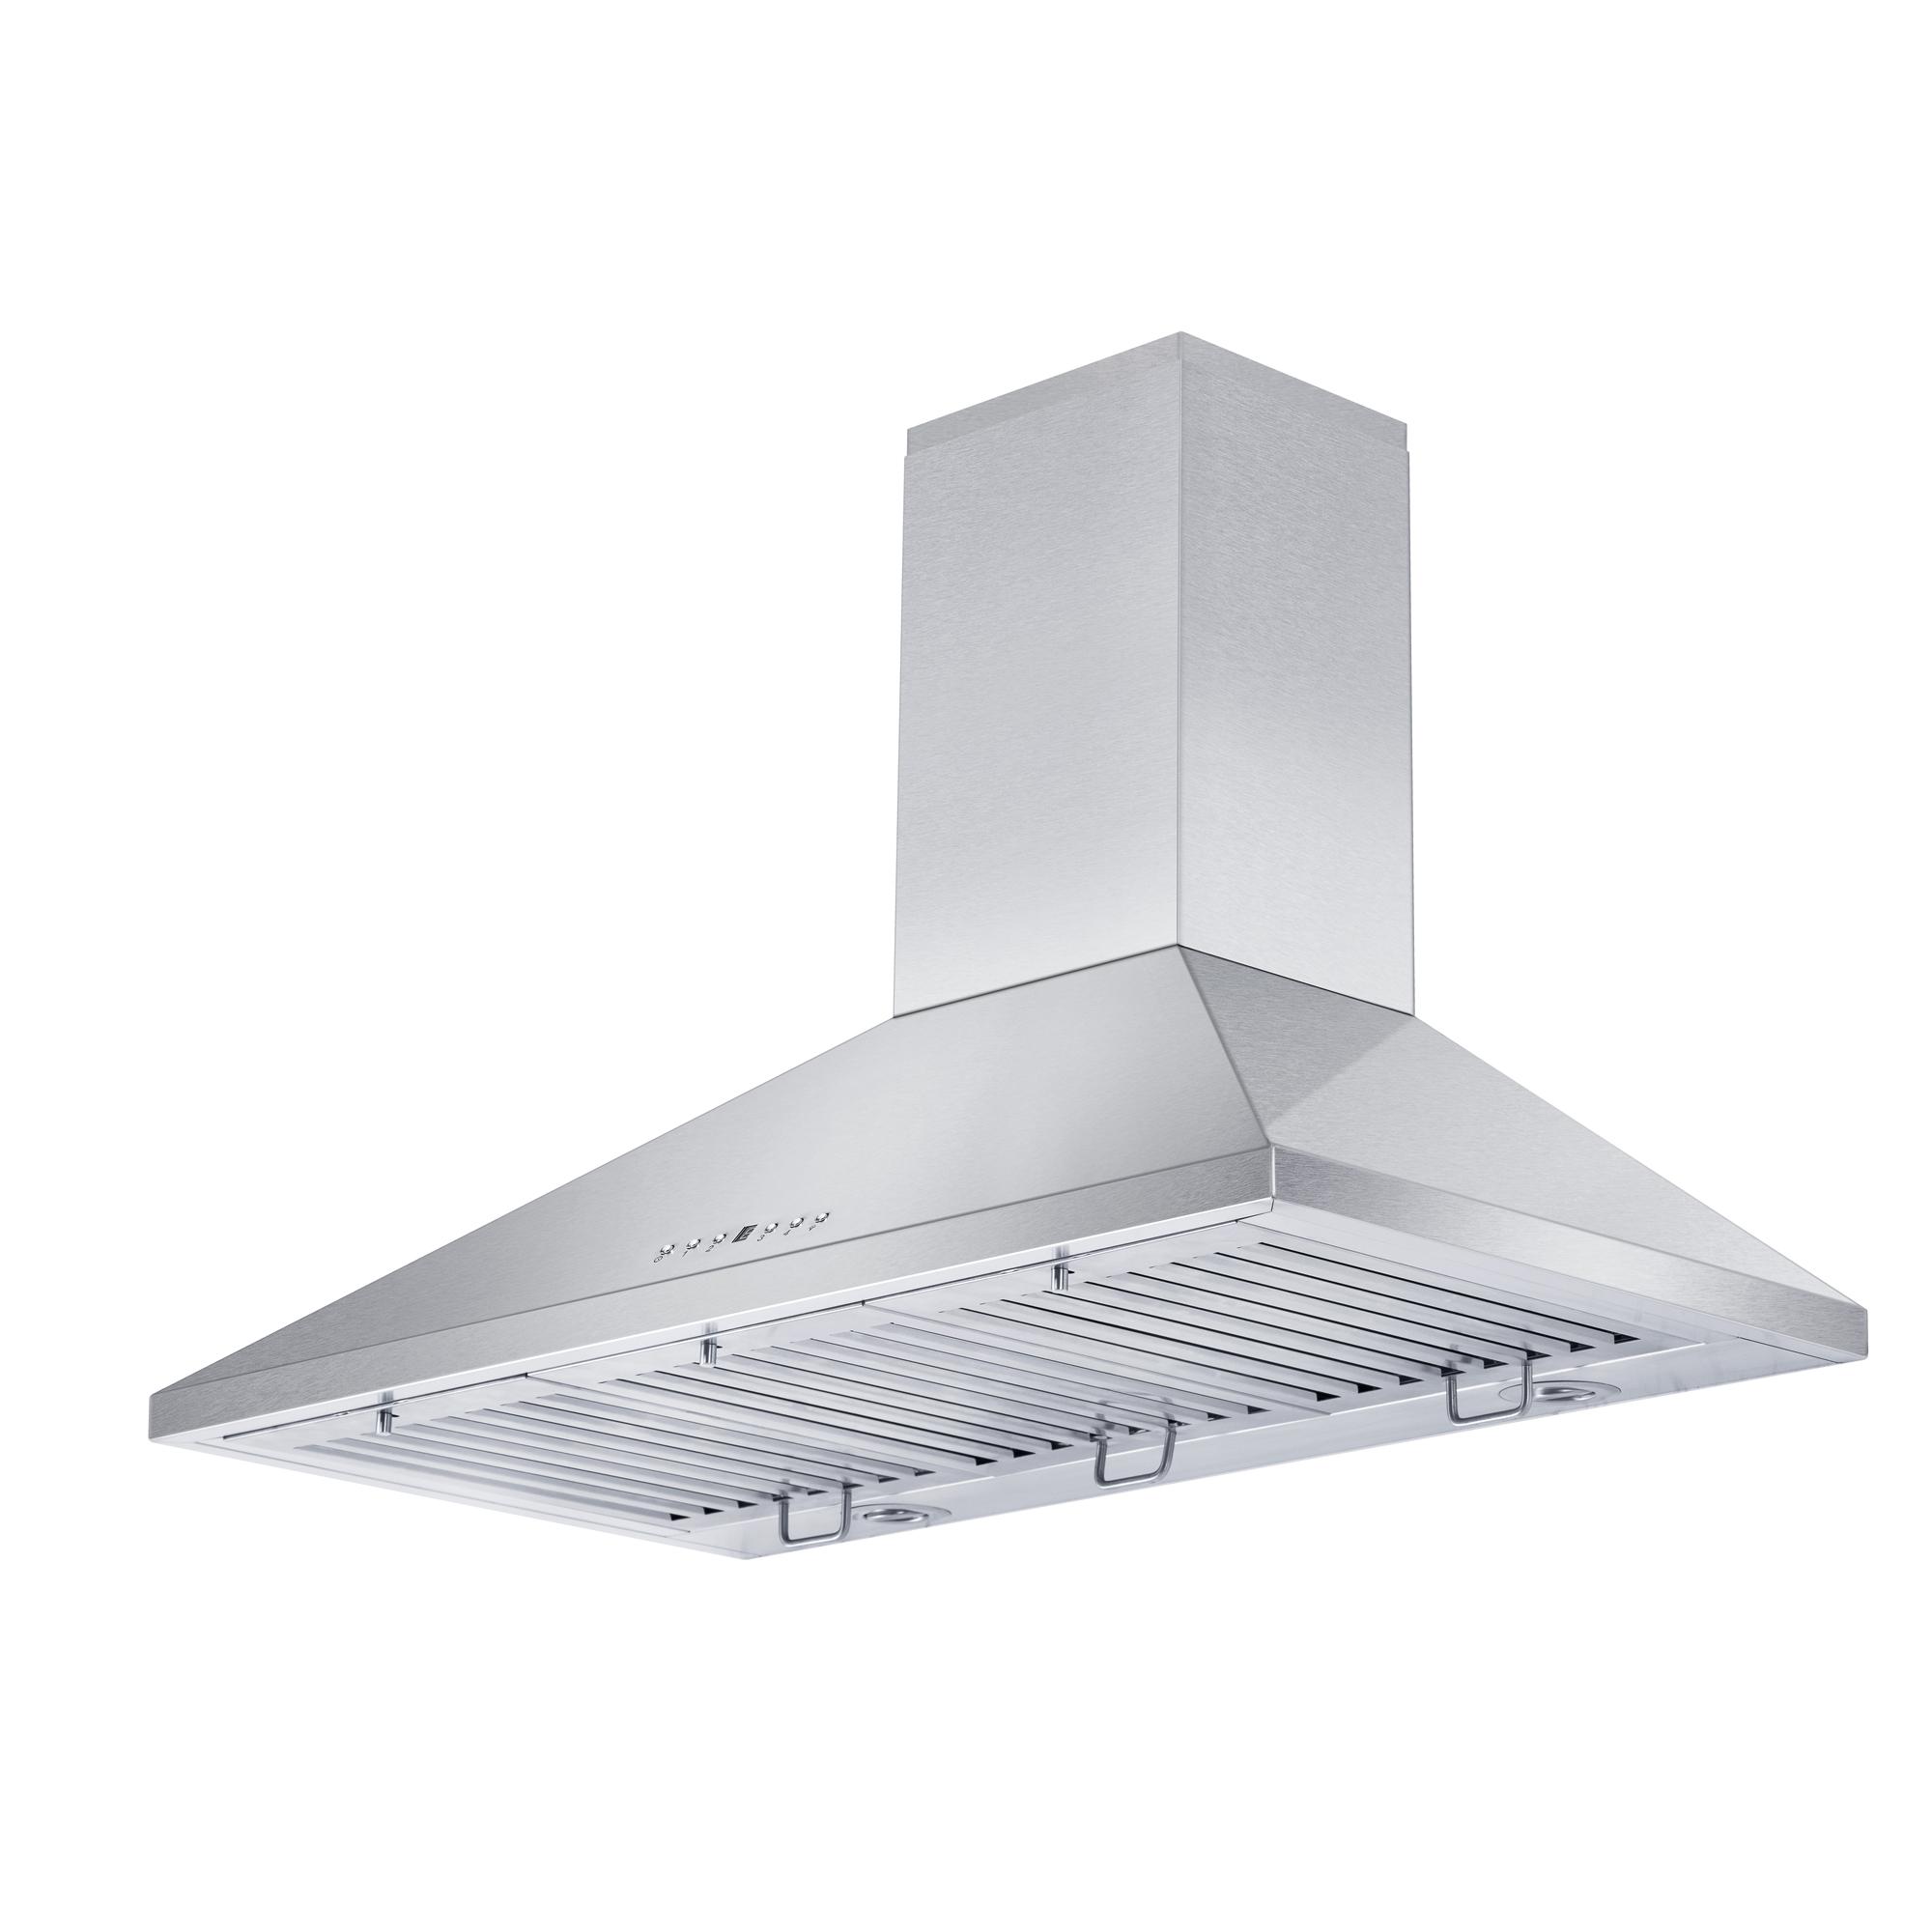 zline-stainless-steel-wall-mounted-range-hood-KL2-new-side-under.jpg